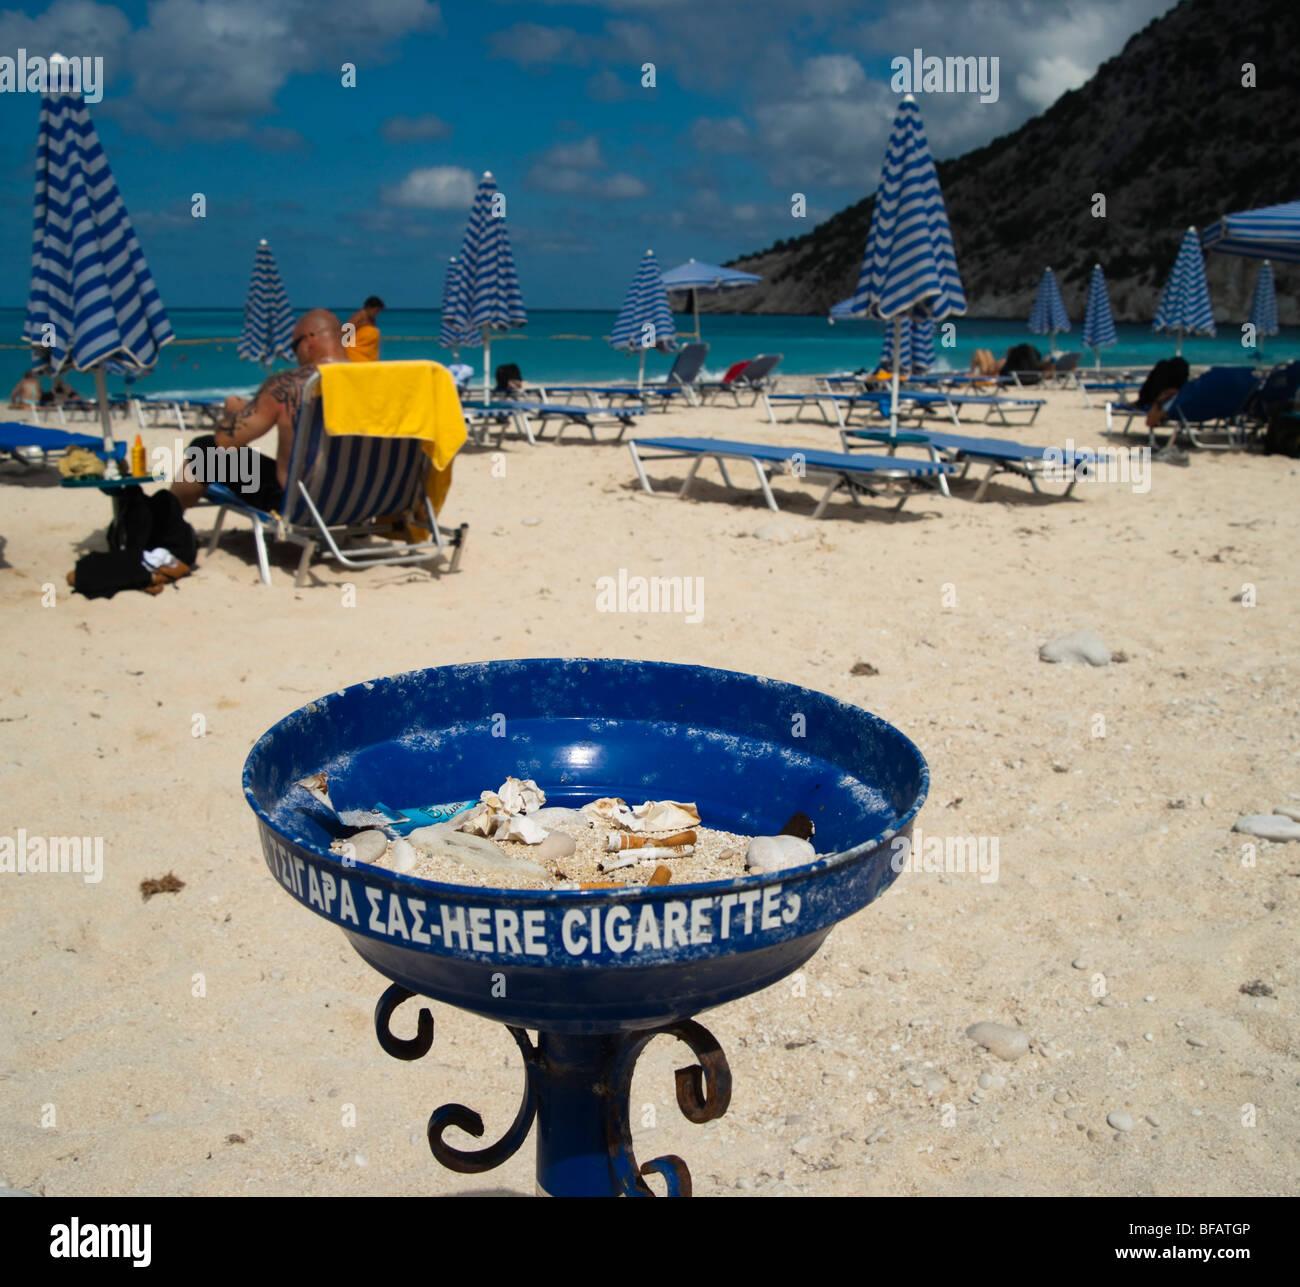 cigarette beach stockfotos cigarette beach bilder alamy. Black Bedroom Furniture Sets. Home Design Ideas